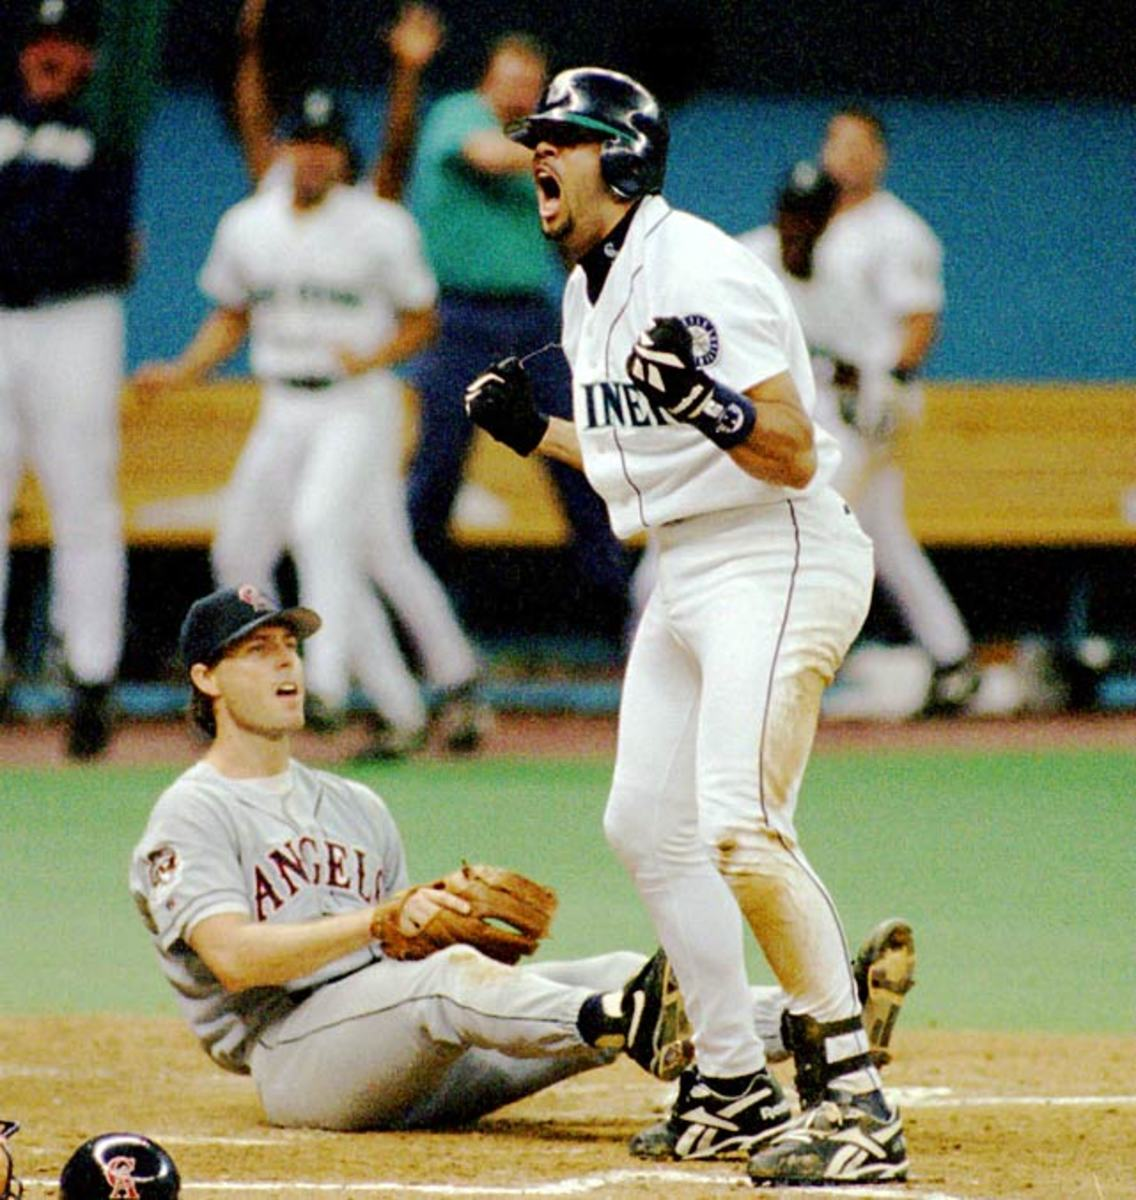 1995 American League West